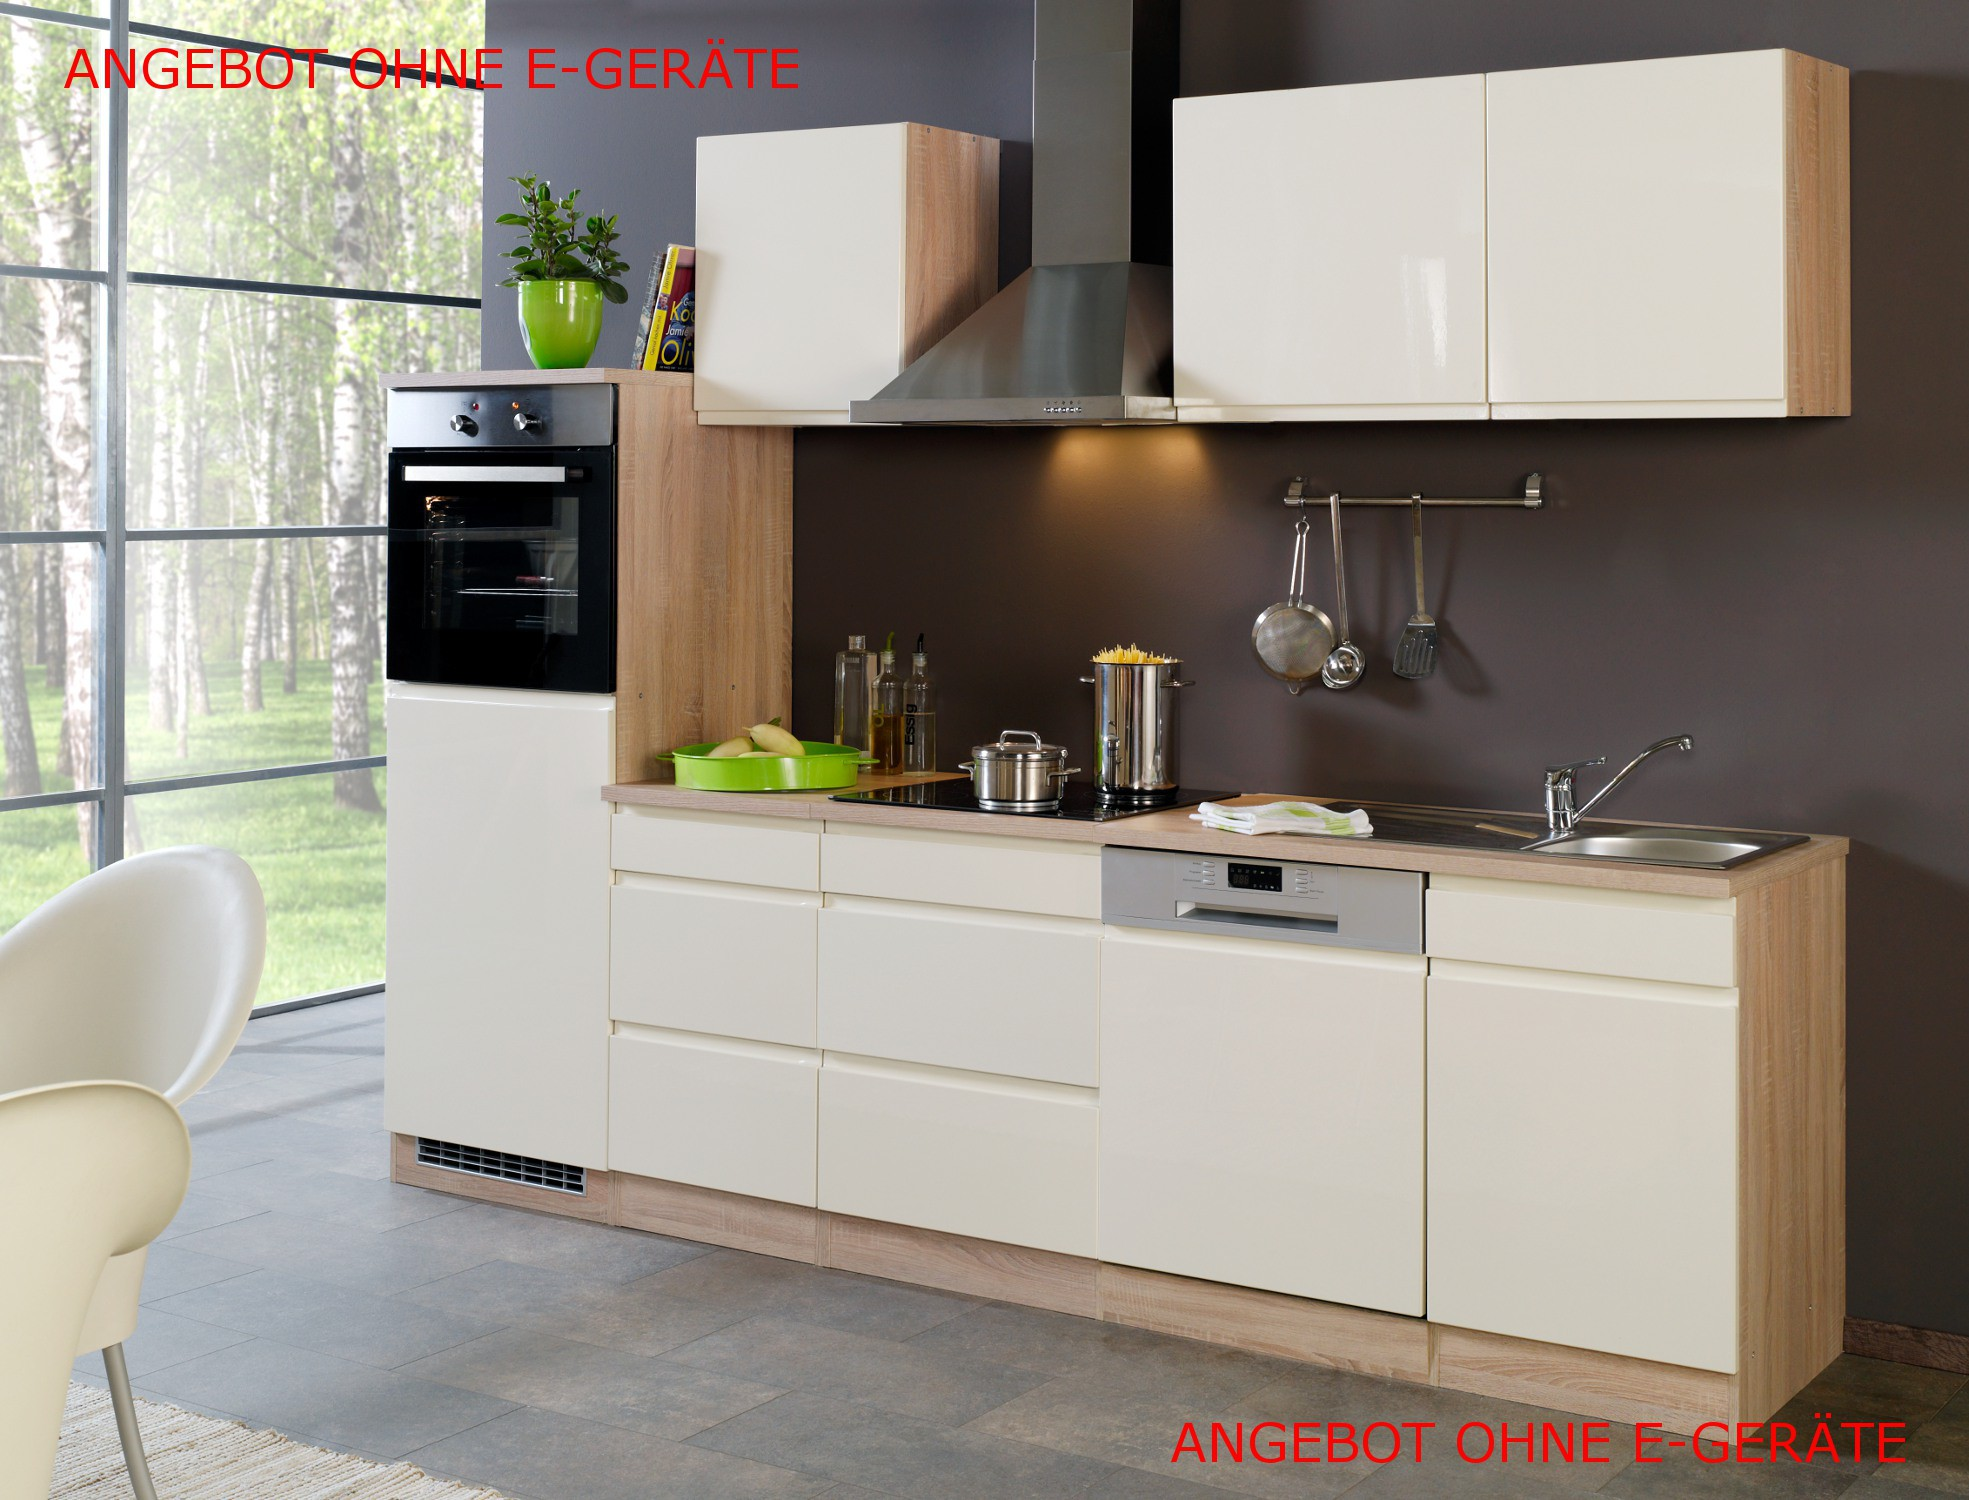 Full Size of Nobilia Küche Ohne Geräte Günstige Küche Ohne Geräte Respekta Küche Ohne Geräte Komplette Küche Ohne Geräte Küche Küche Ohne Geräte